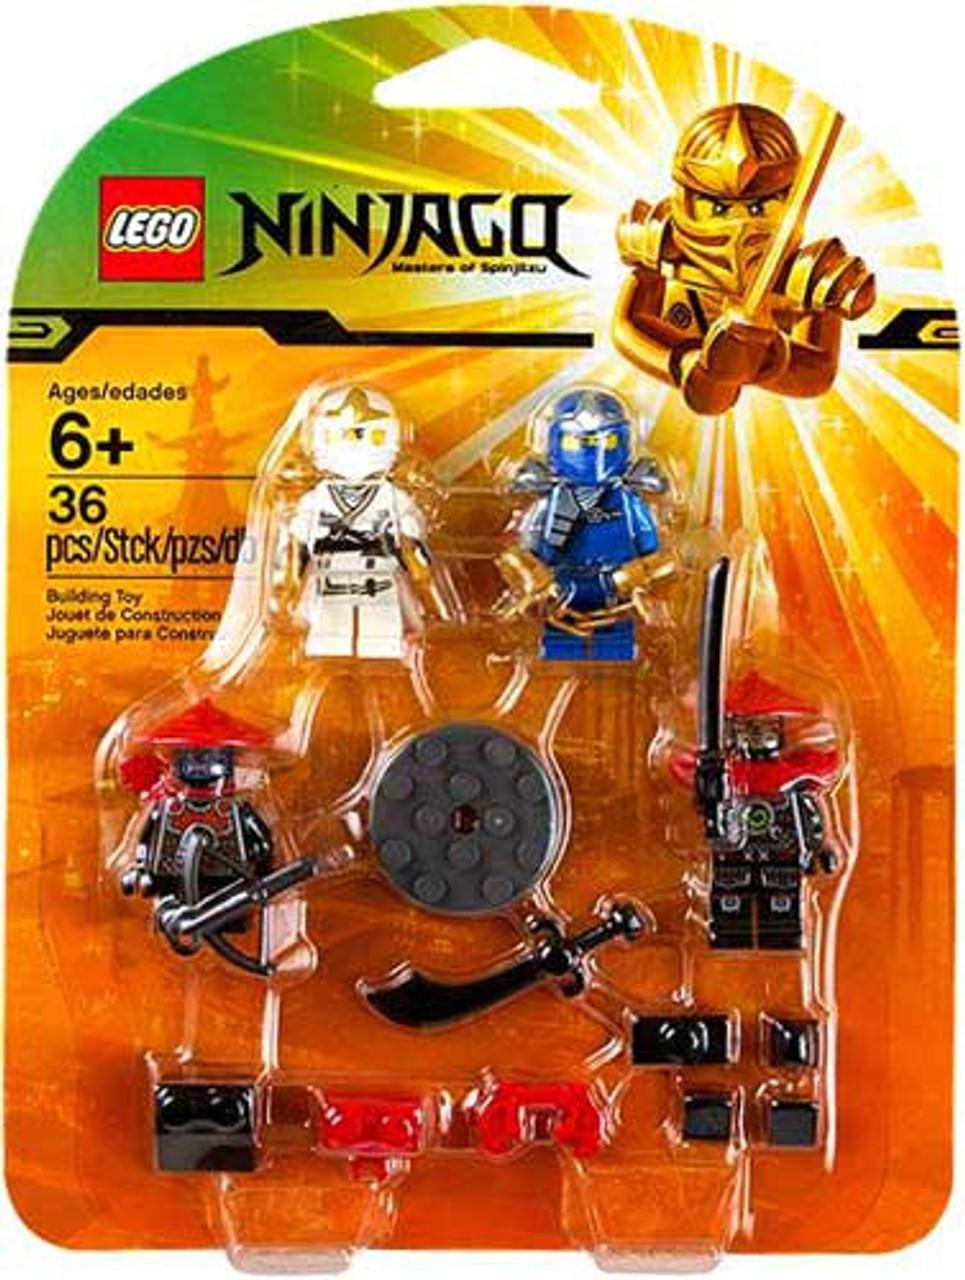 LEGO Ninjago Spinjitzu Spinners Samurai Accessories Set #850632